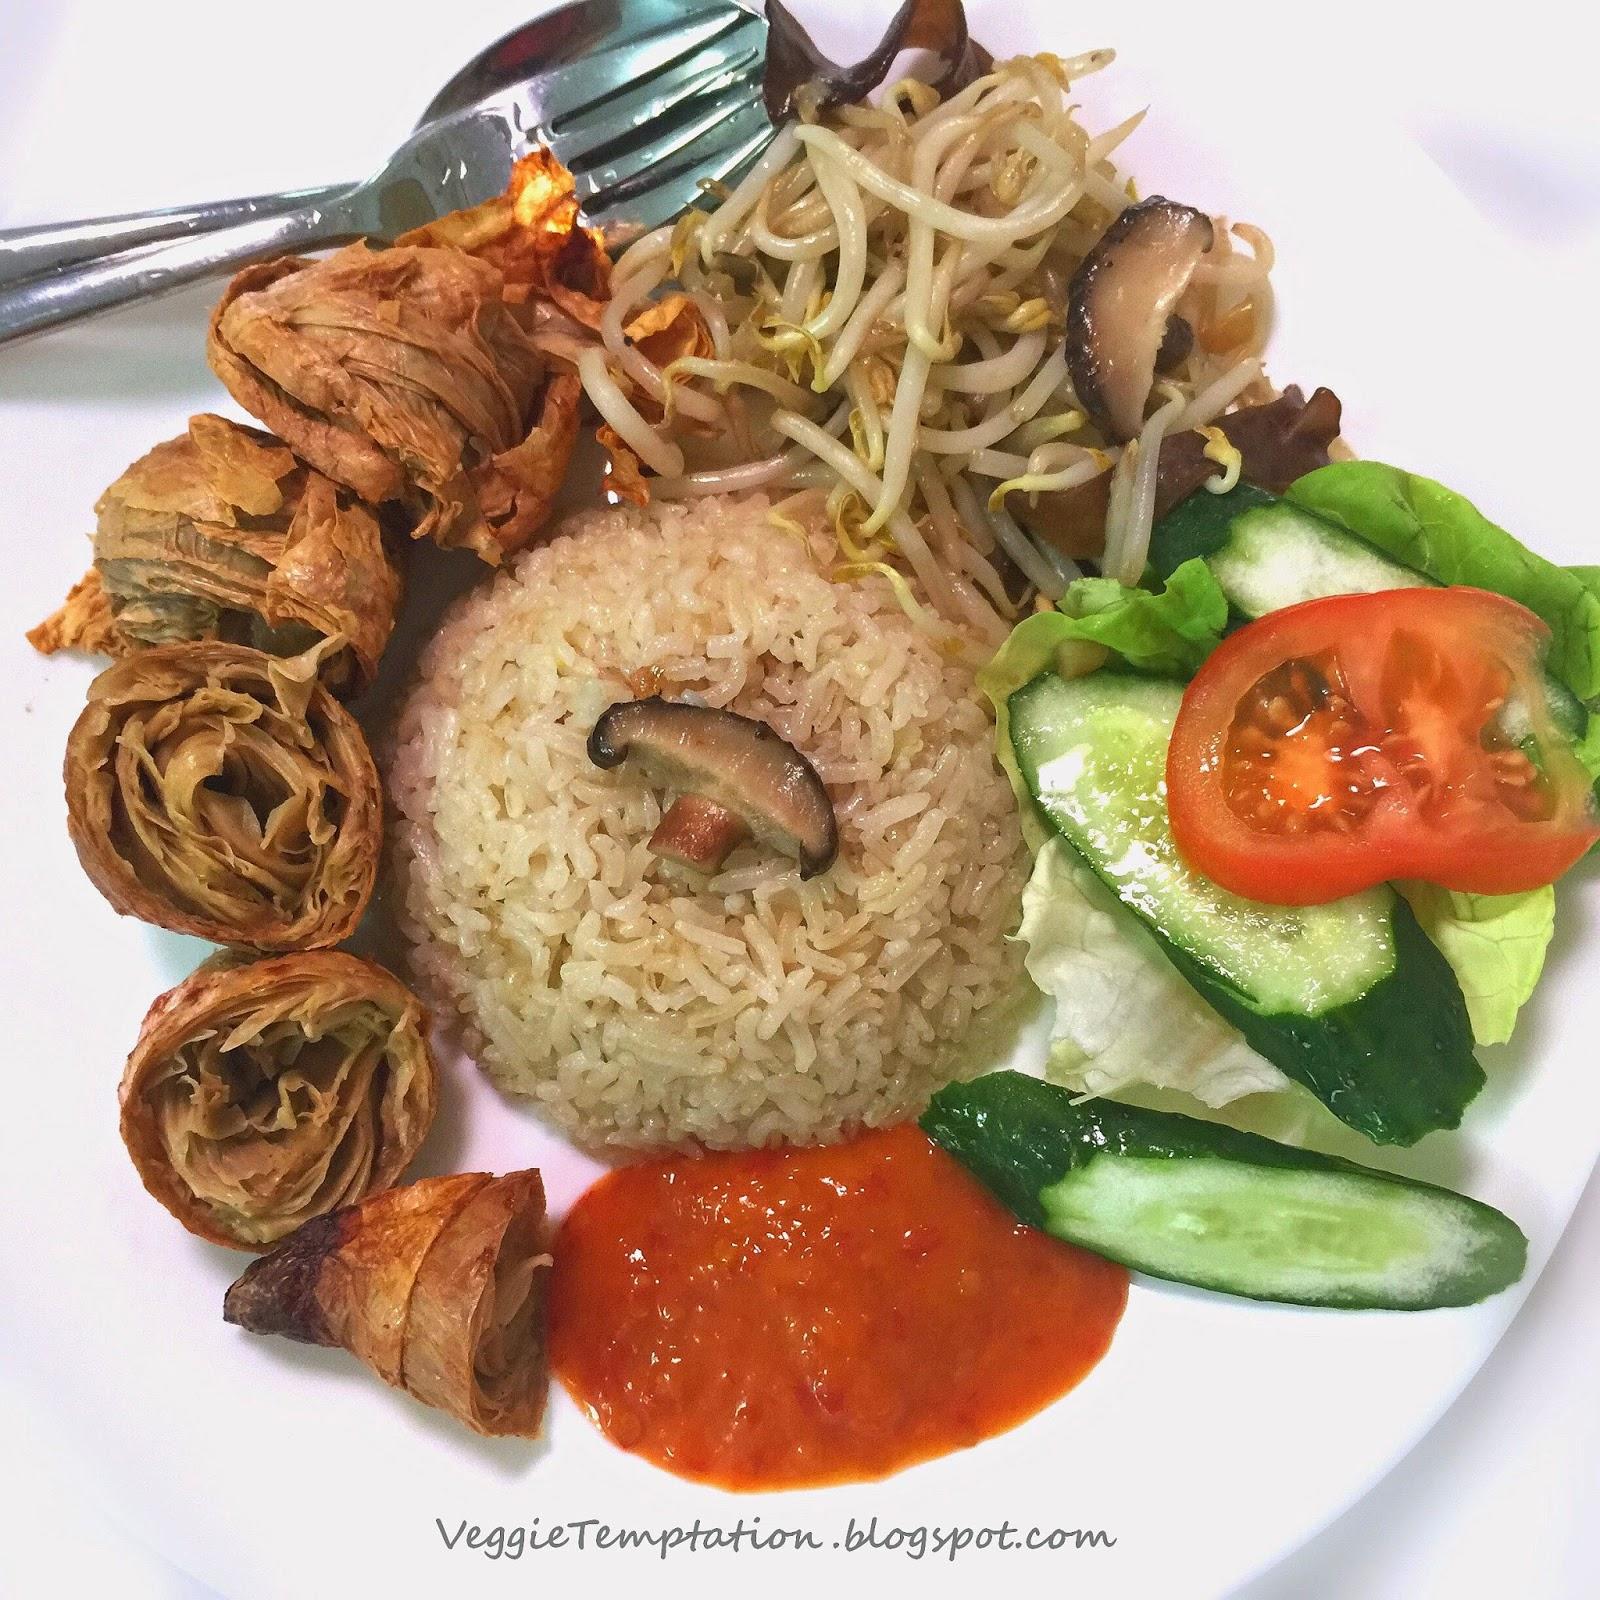 Vegetarian Vegan: Veggie Temptation: Vegan/Vegetarian Roasted Chicken Rice